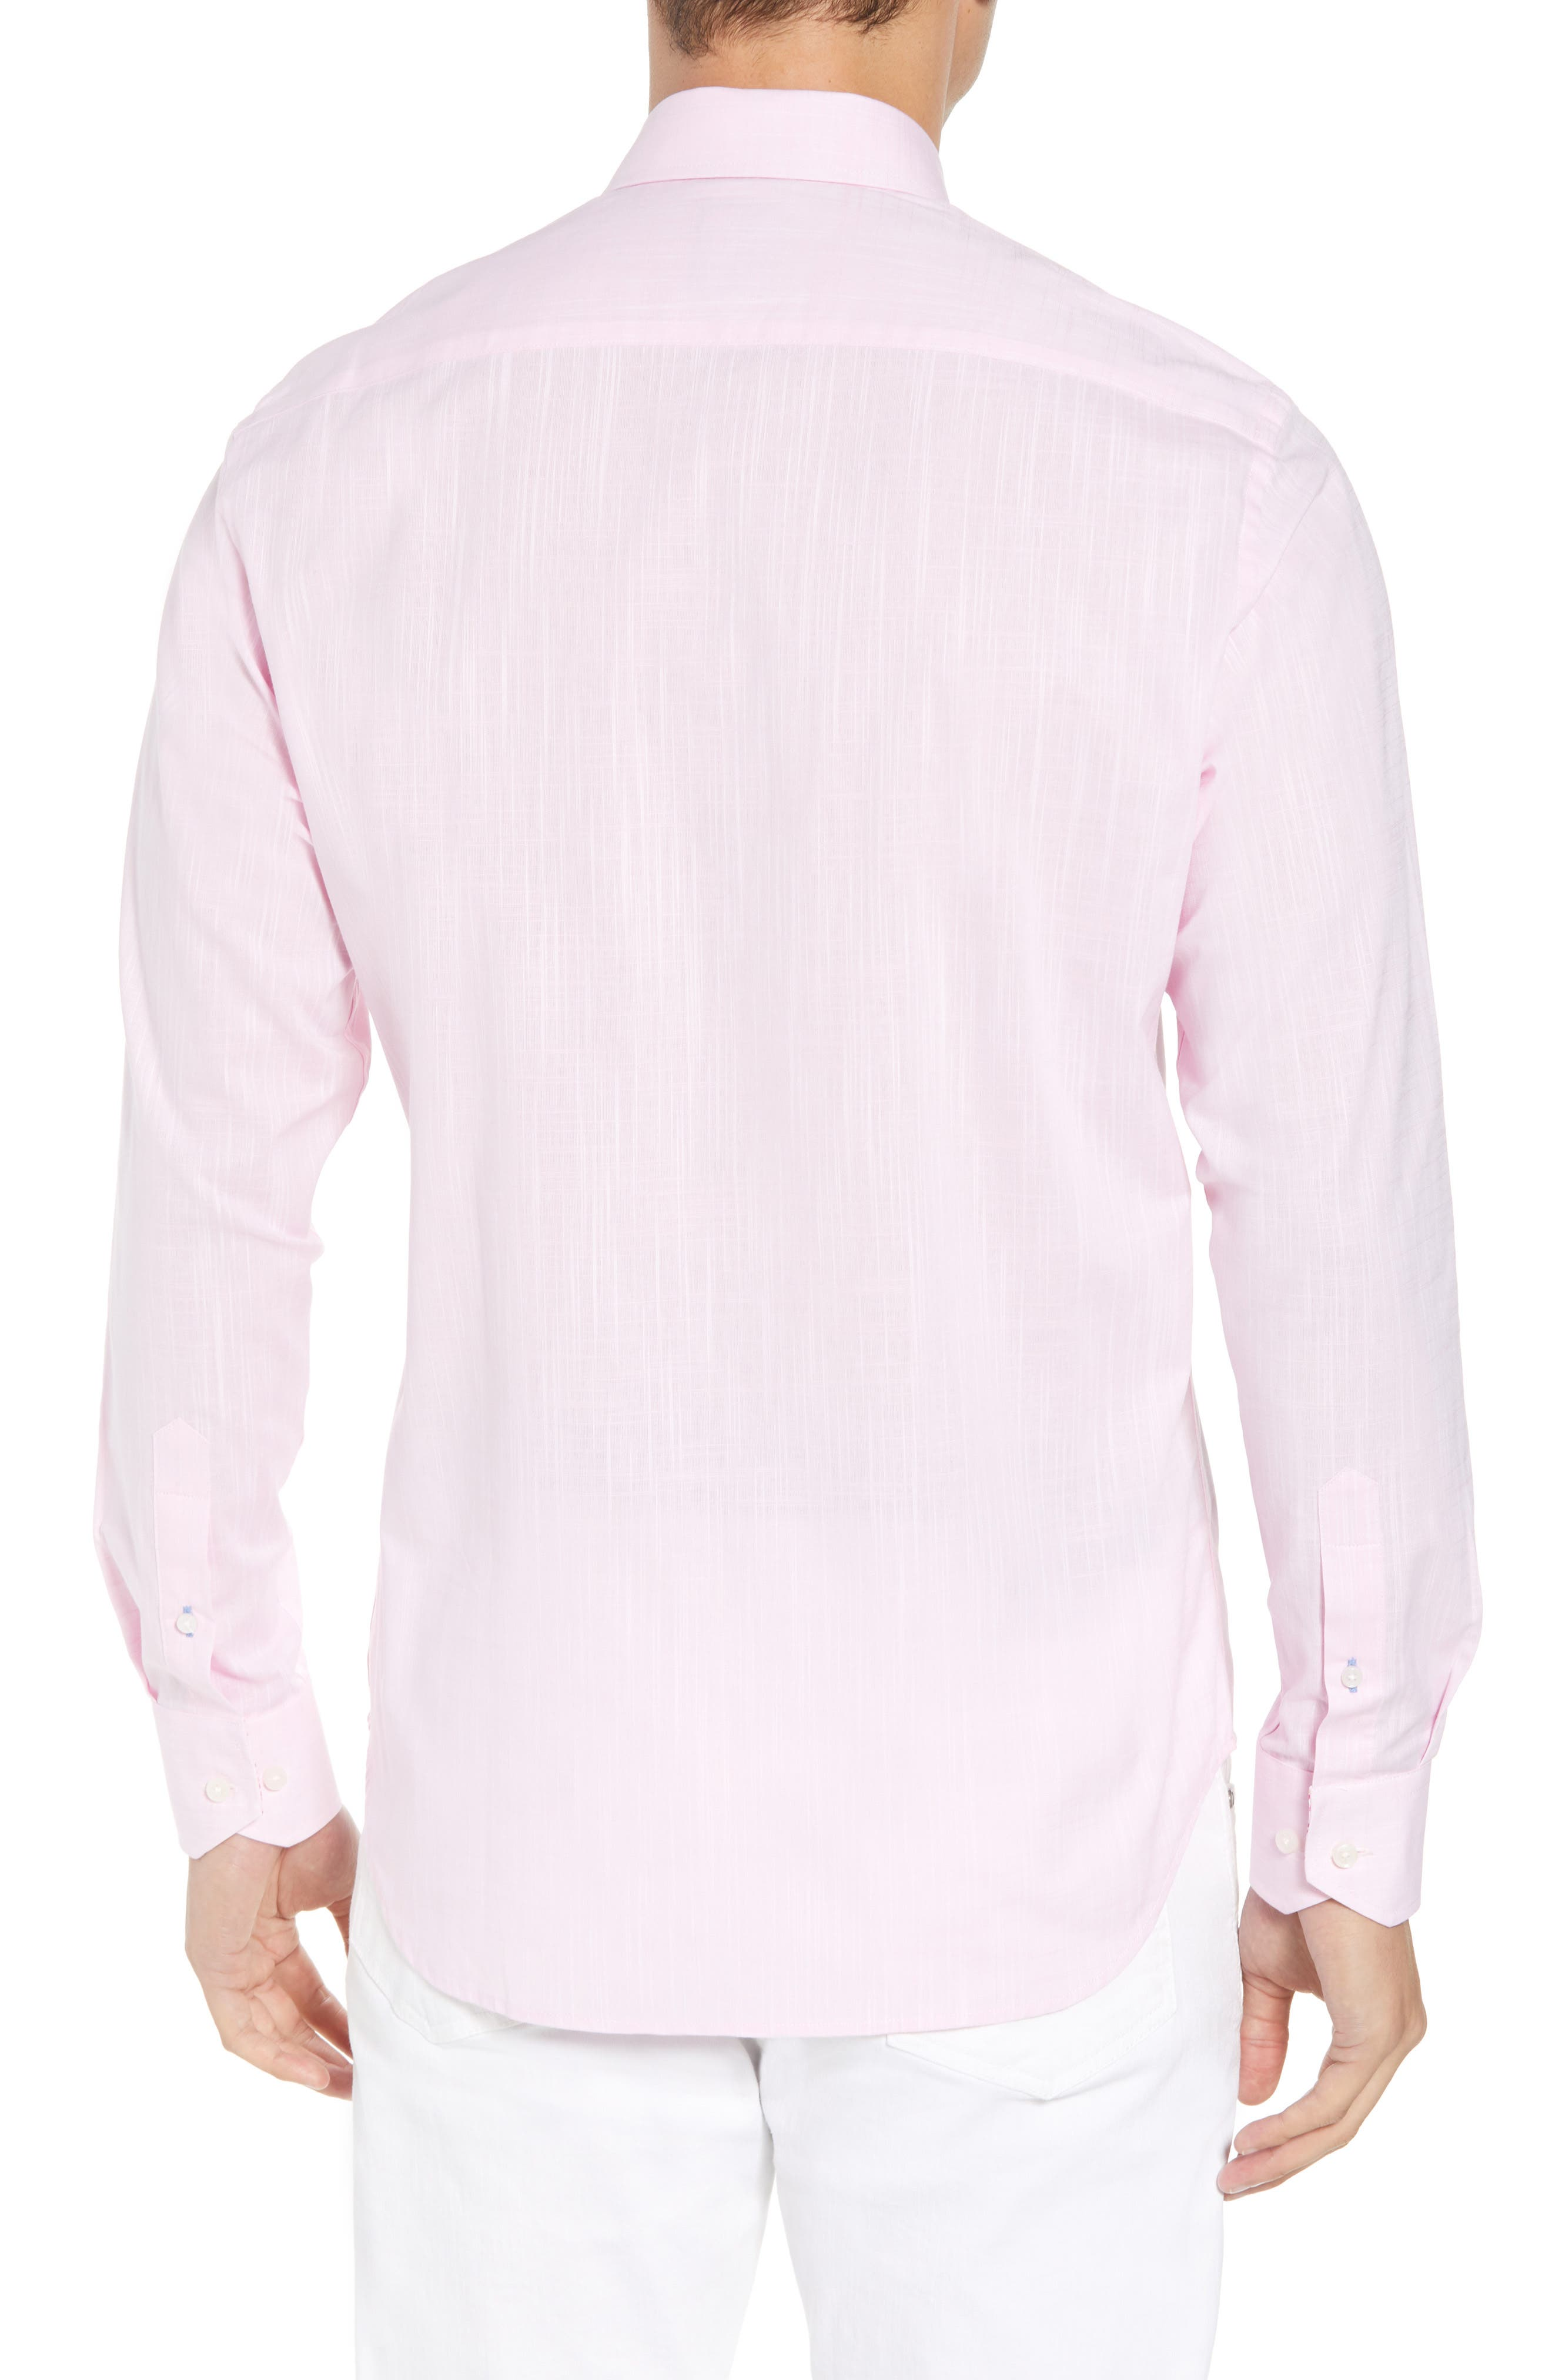 Kade Regular Fit Sport Shirt,                             Alternate thumbnail 3, color,                             Pink